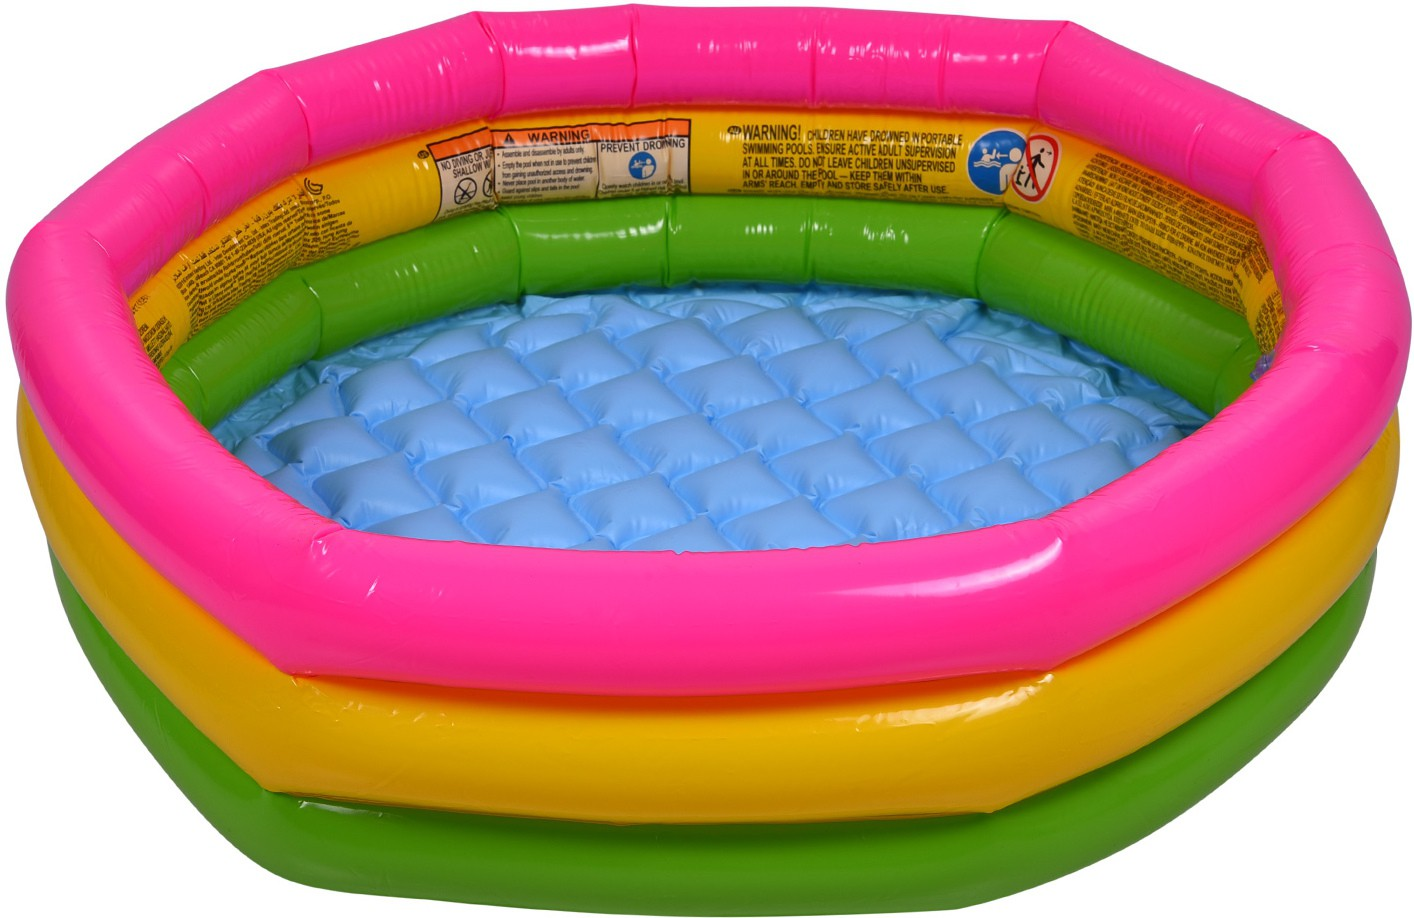 View Brecken Paul Kids Inflatable Portable Pool(86 cm, 25 cm) Furniture (Brecken Paul)